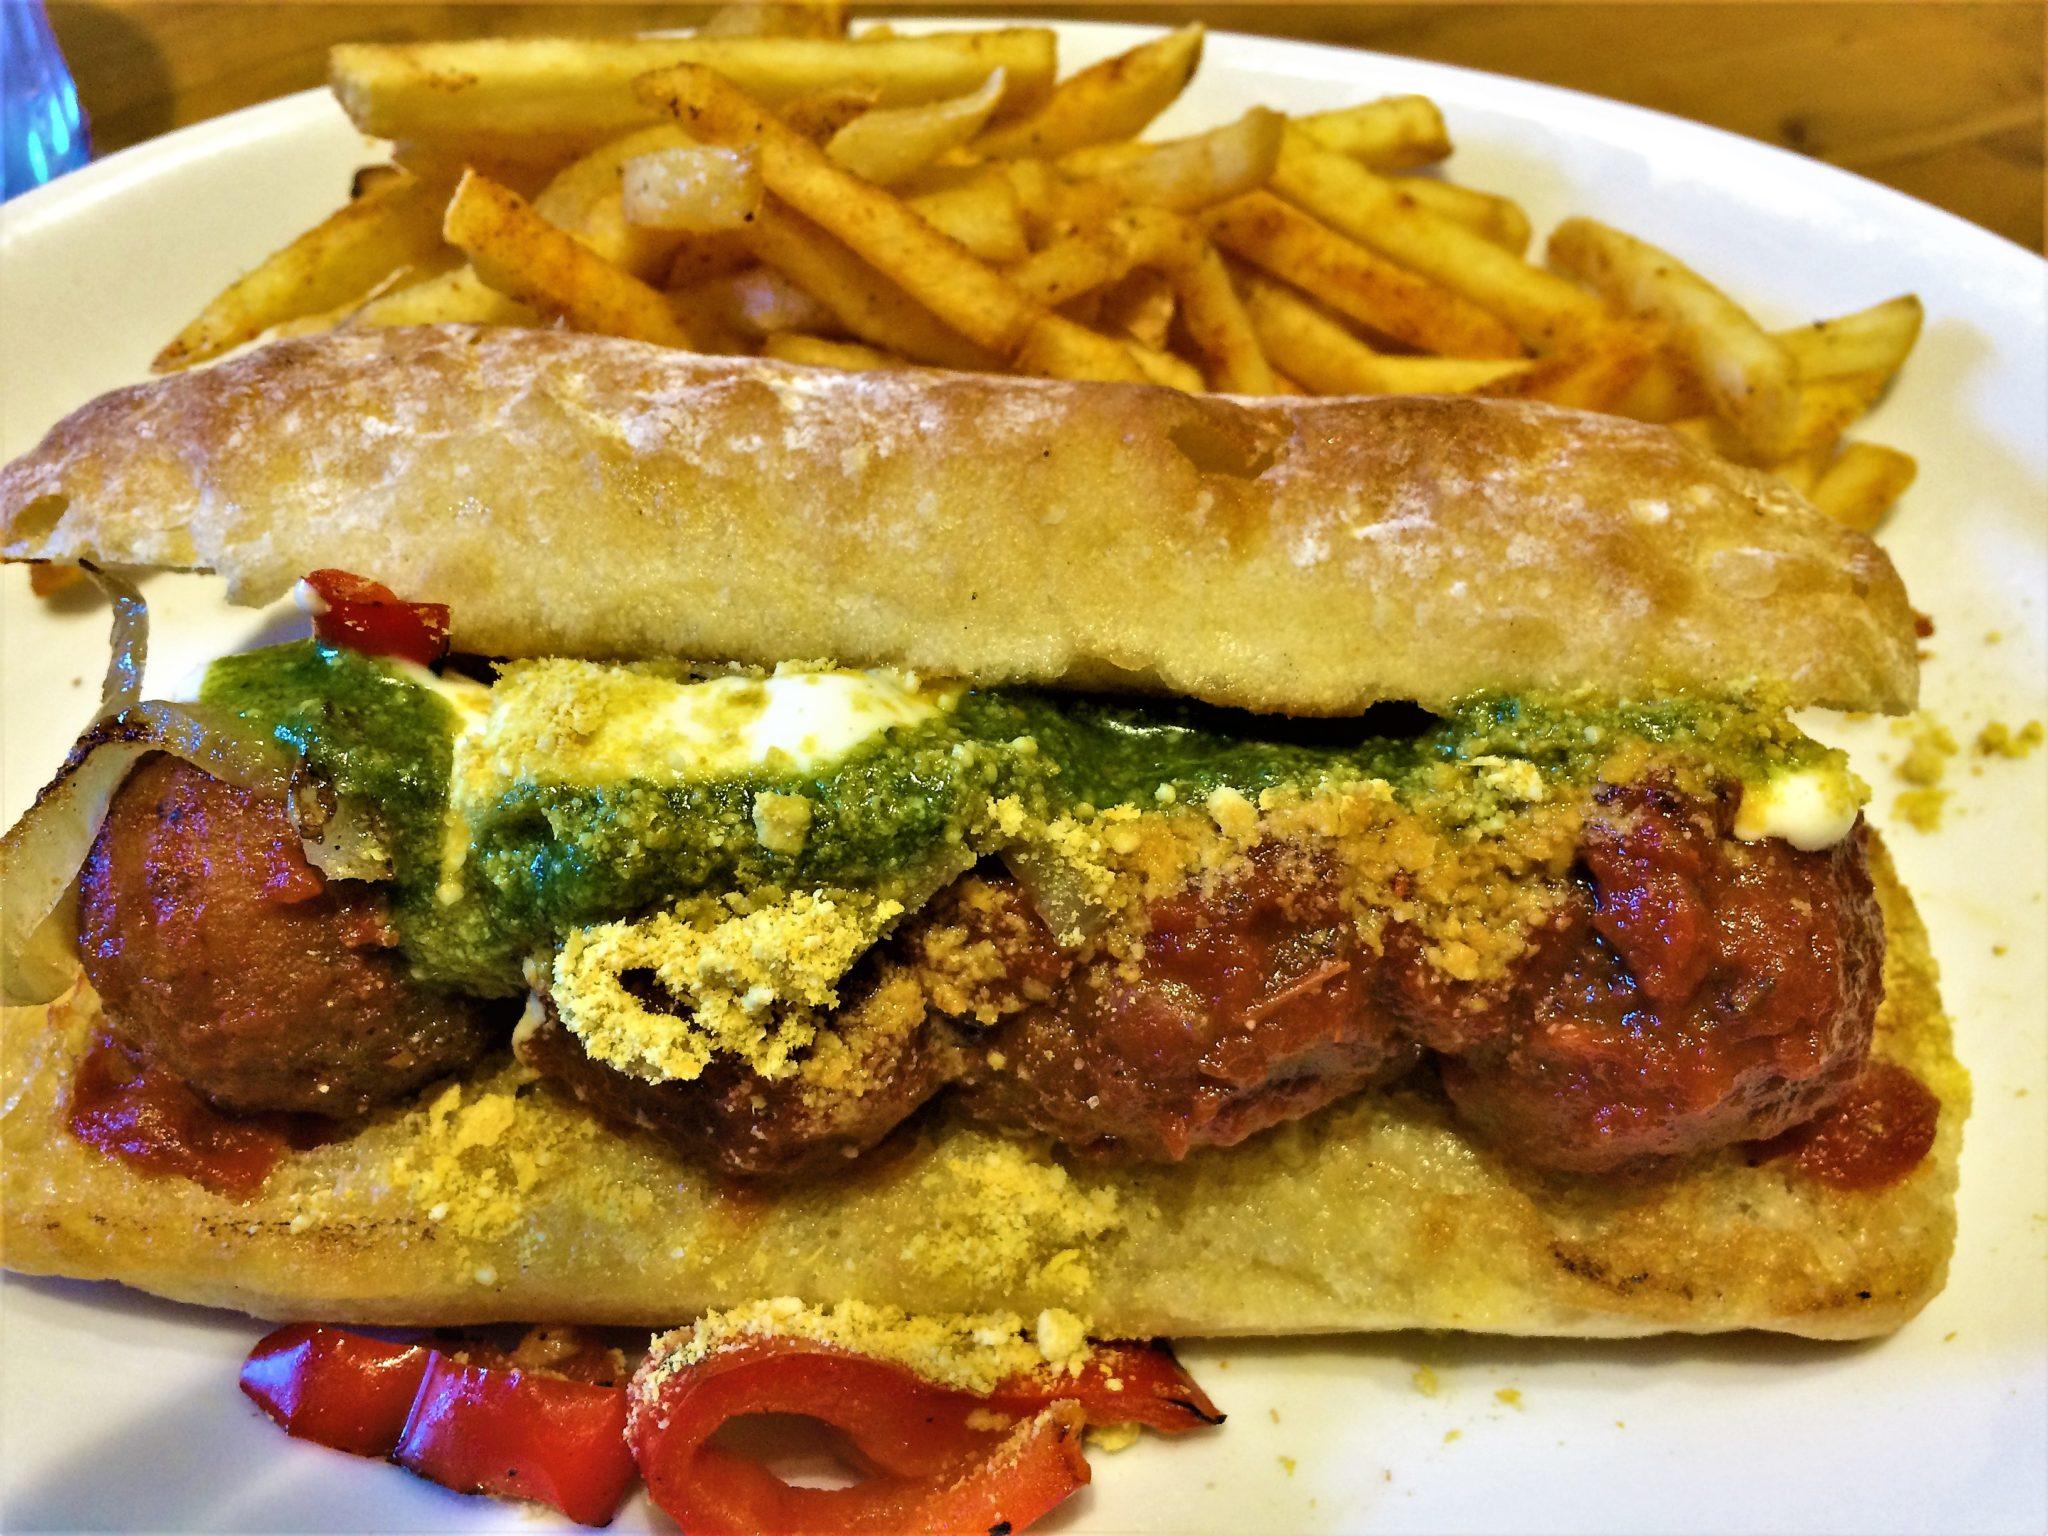 Vegan meatball sub, Native food cafe, Palm Springs, California